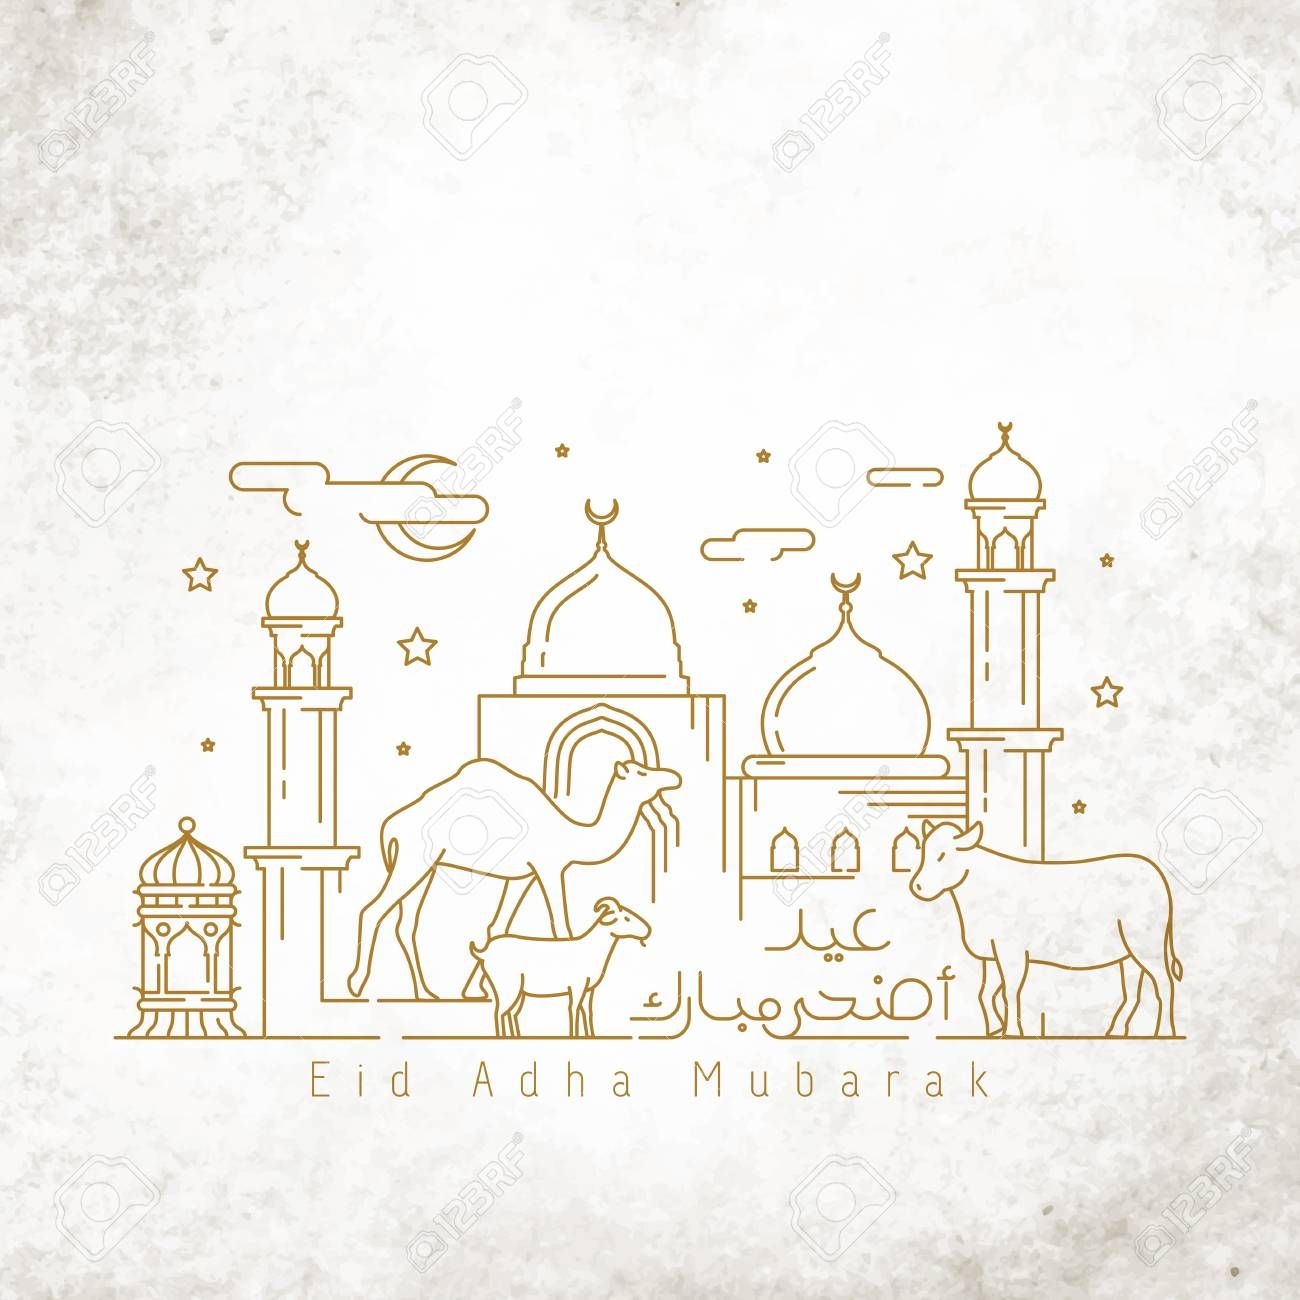 Islamic Greeting Happy Eid Adha Mubarak Greeting Card Template Monoline Illustration Arabic L Eid Card Template Greeting Card Template Card Templates Printable